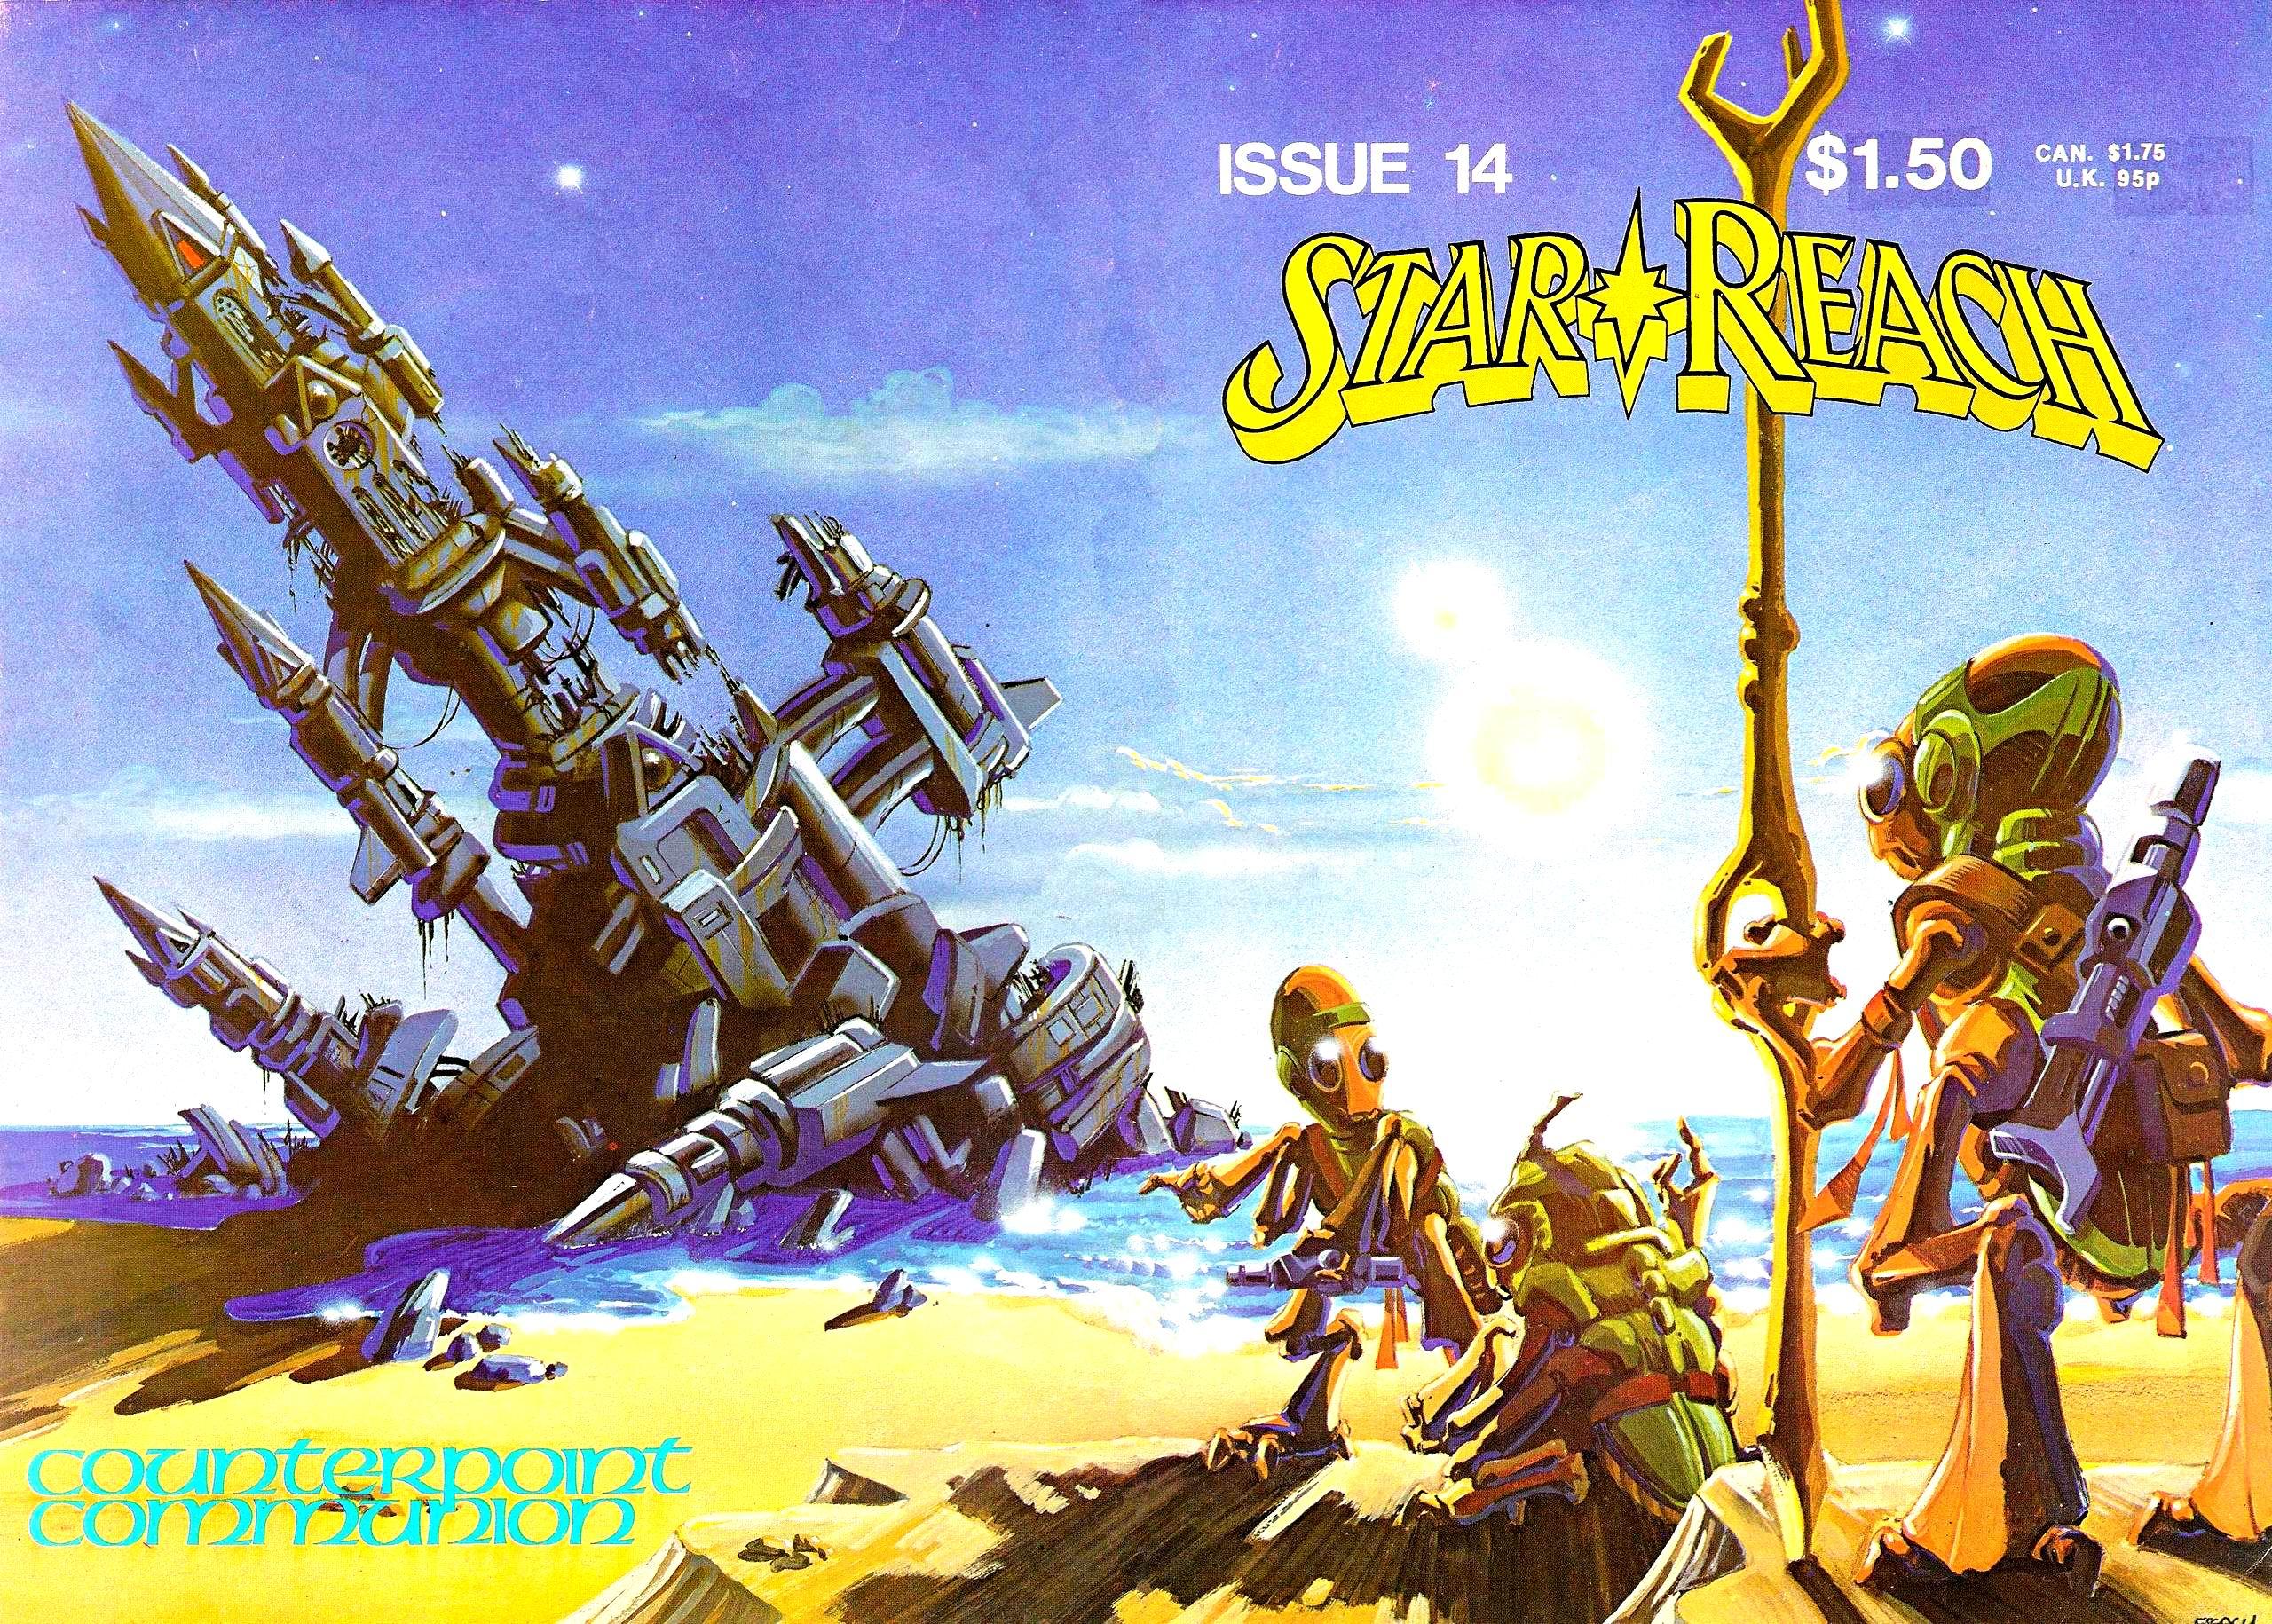 Read online Star*Reach comic -  Issue #14 - 1